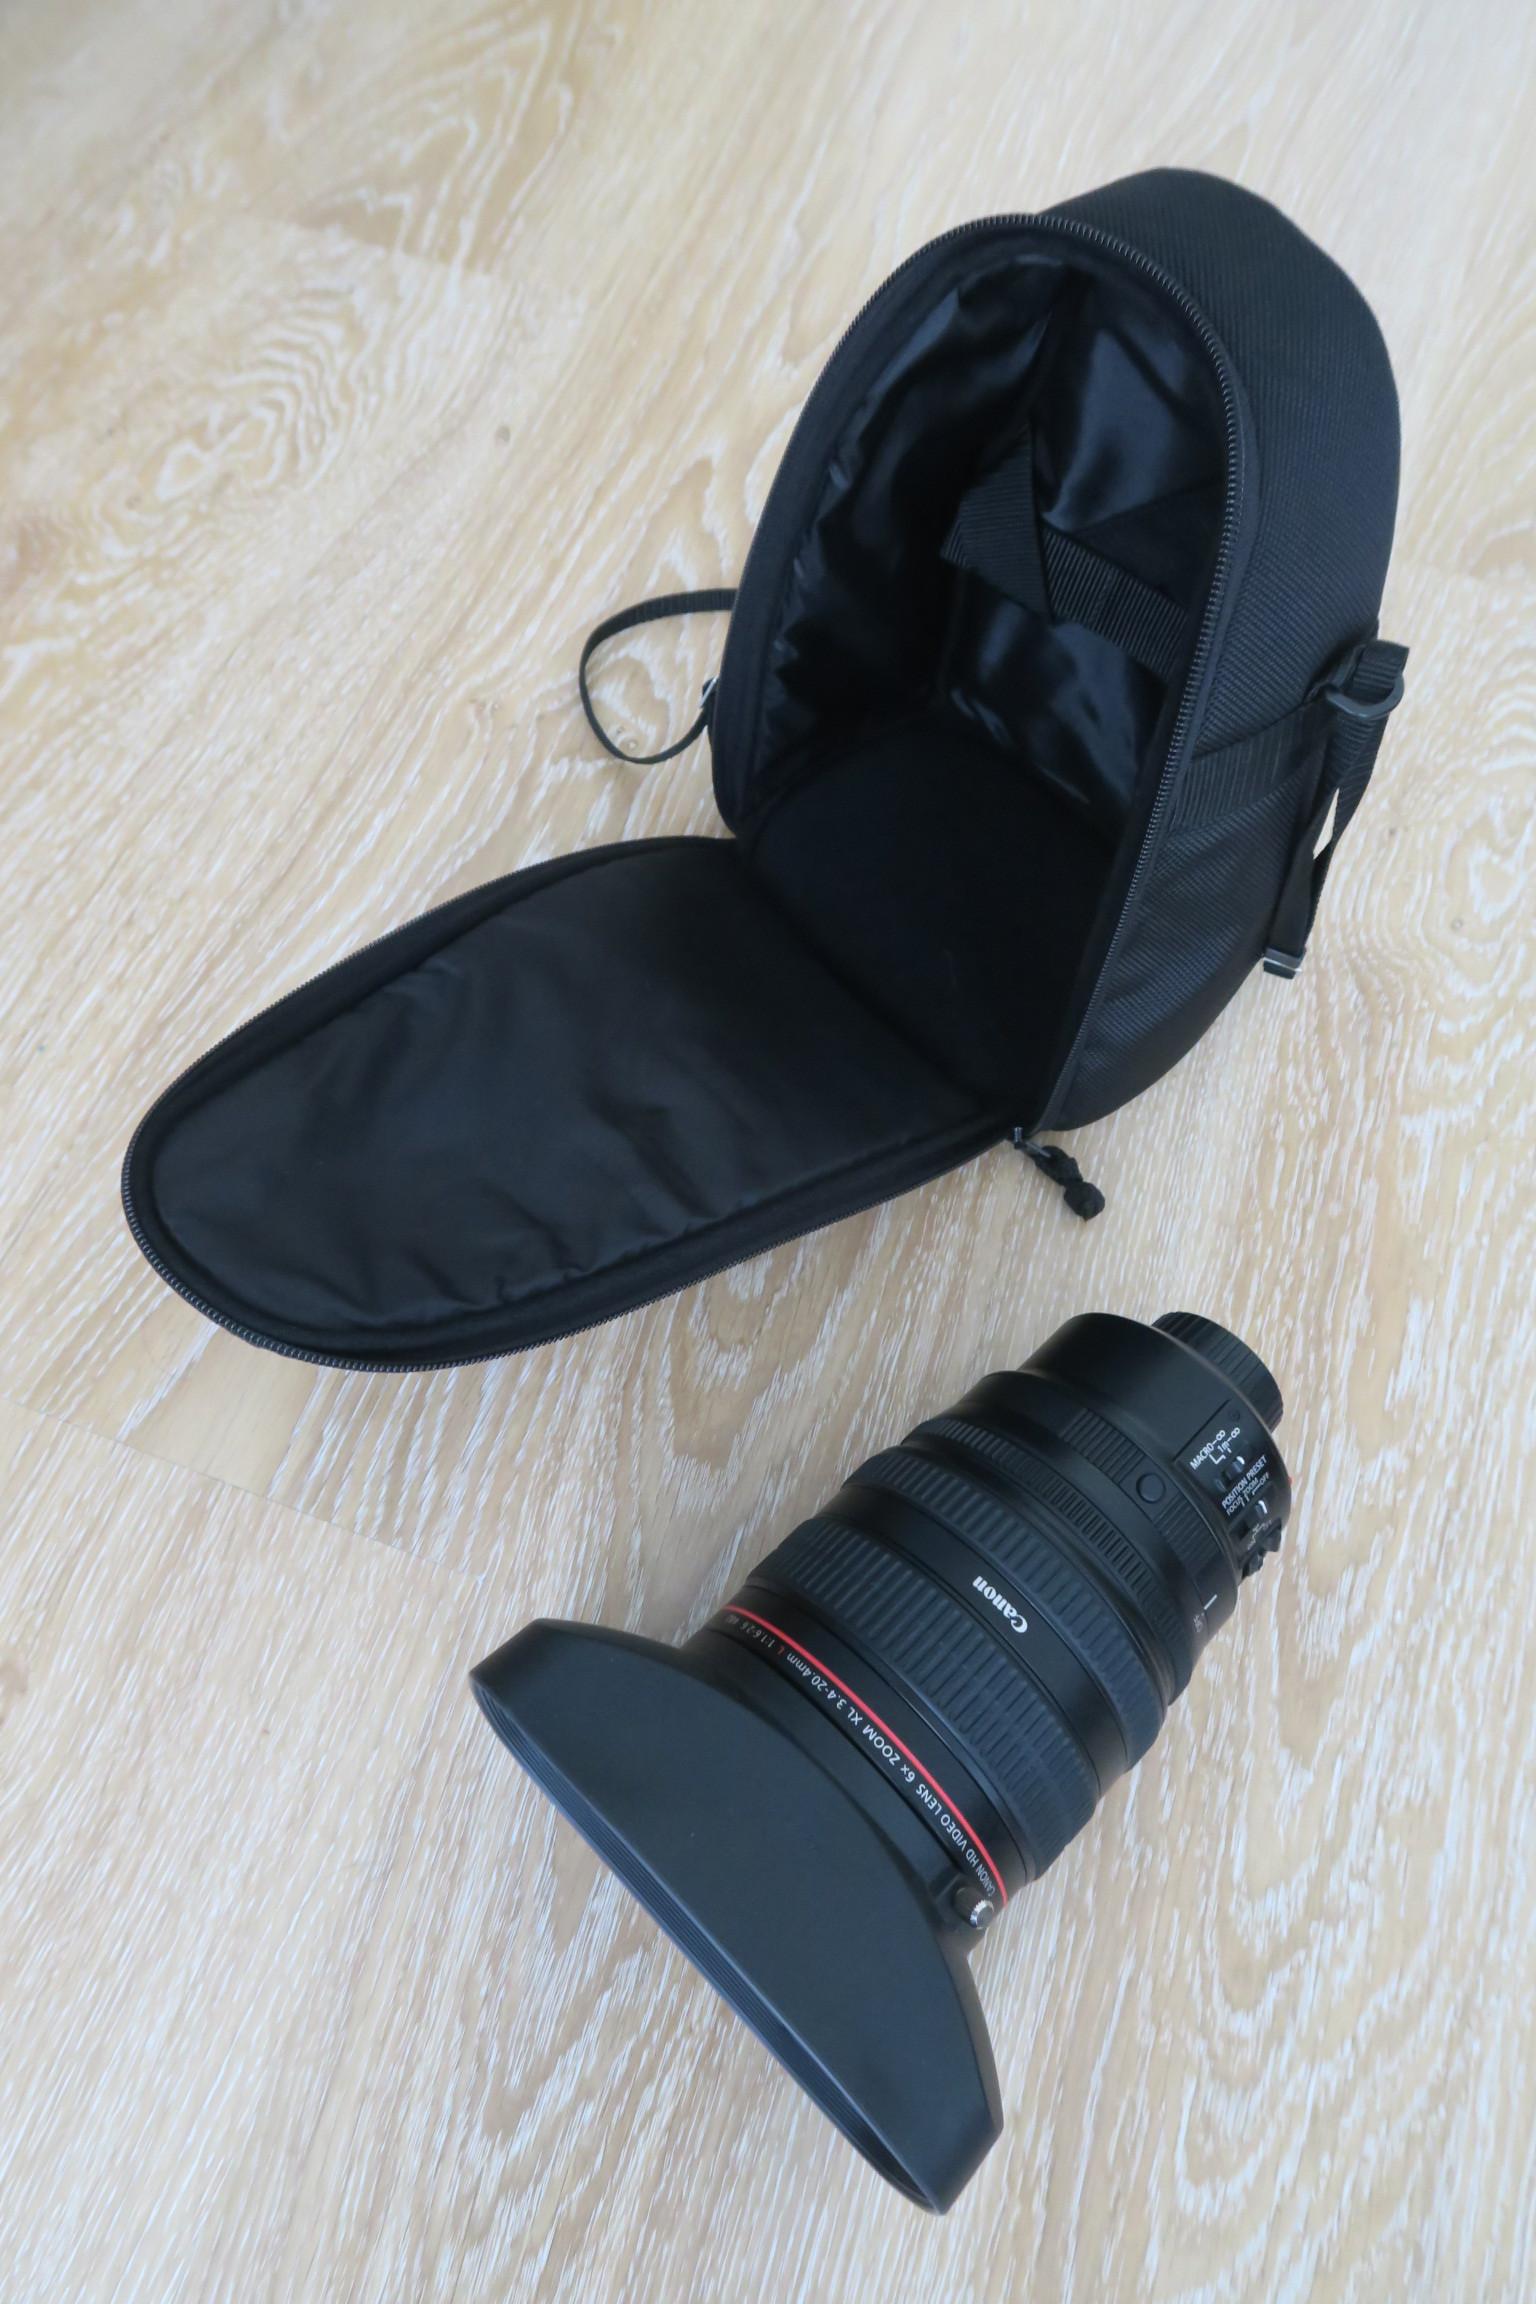 Objectif Canon 6x Zoom XL 3.4-20.4mm L IS